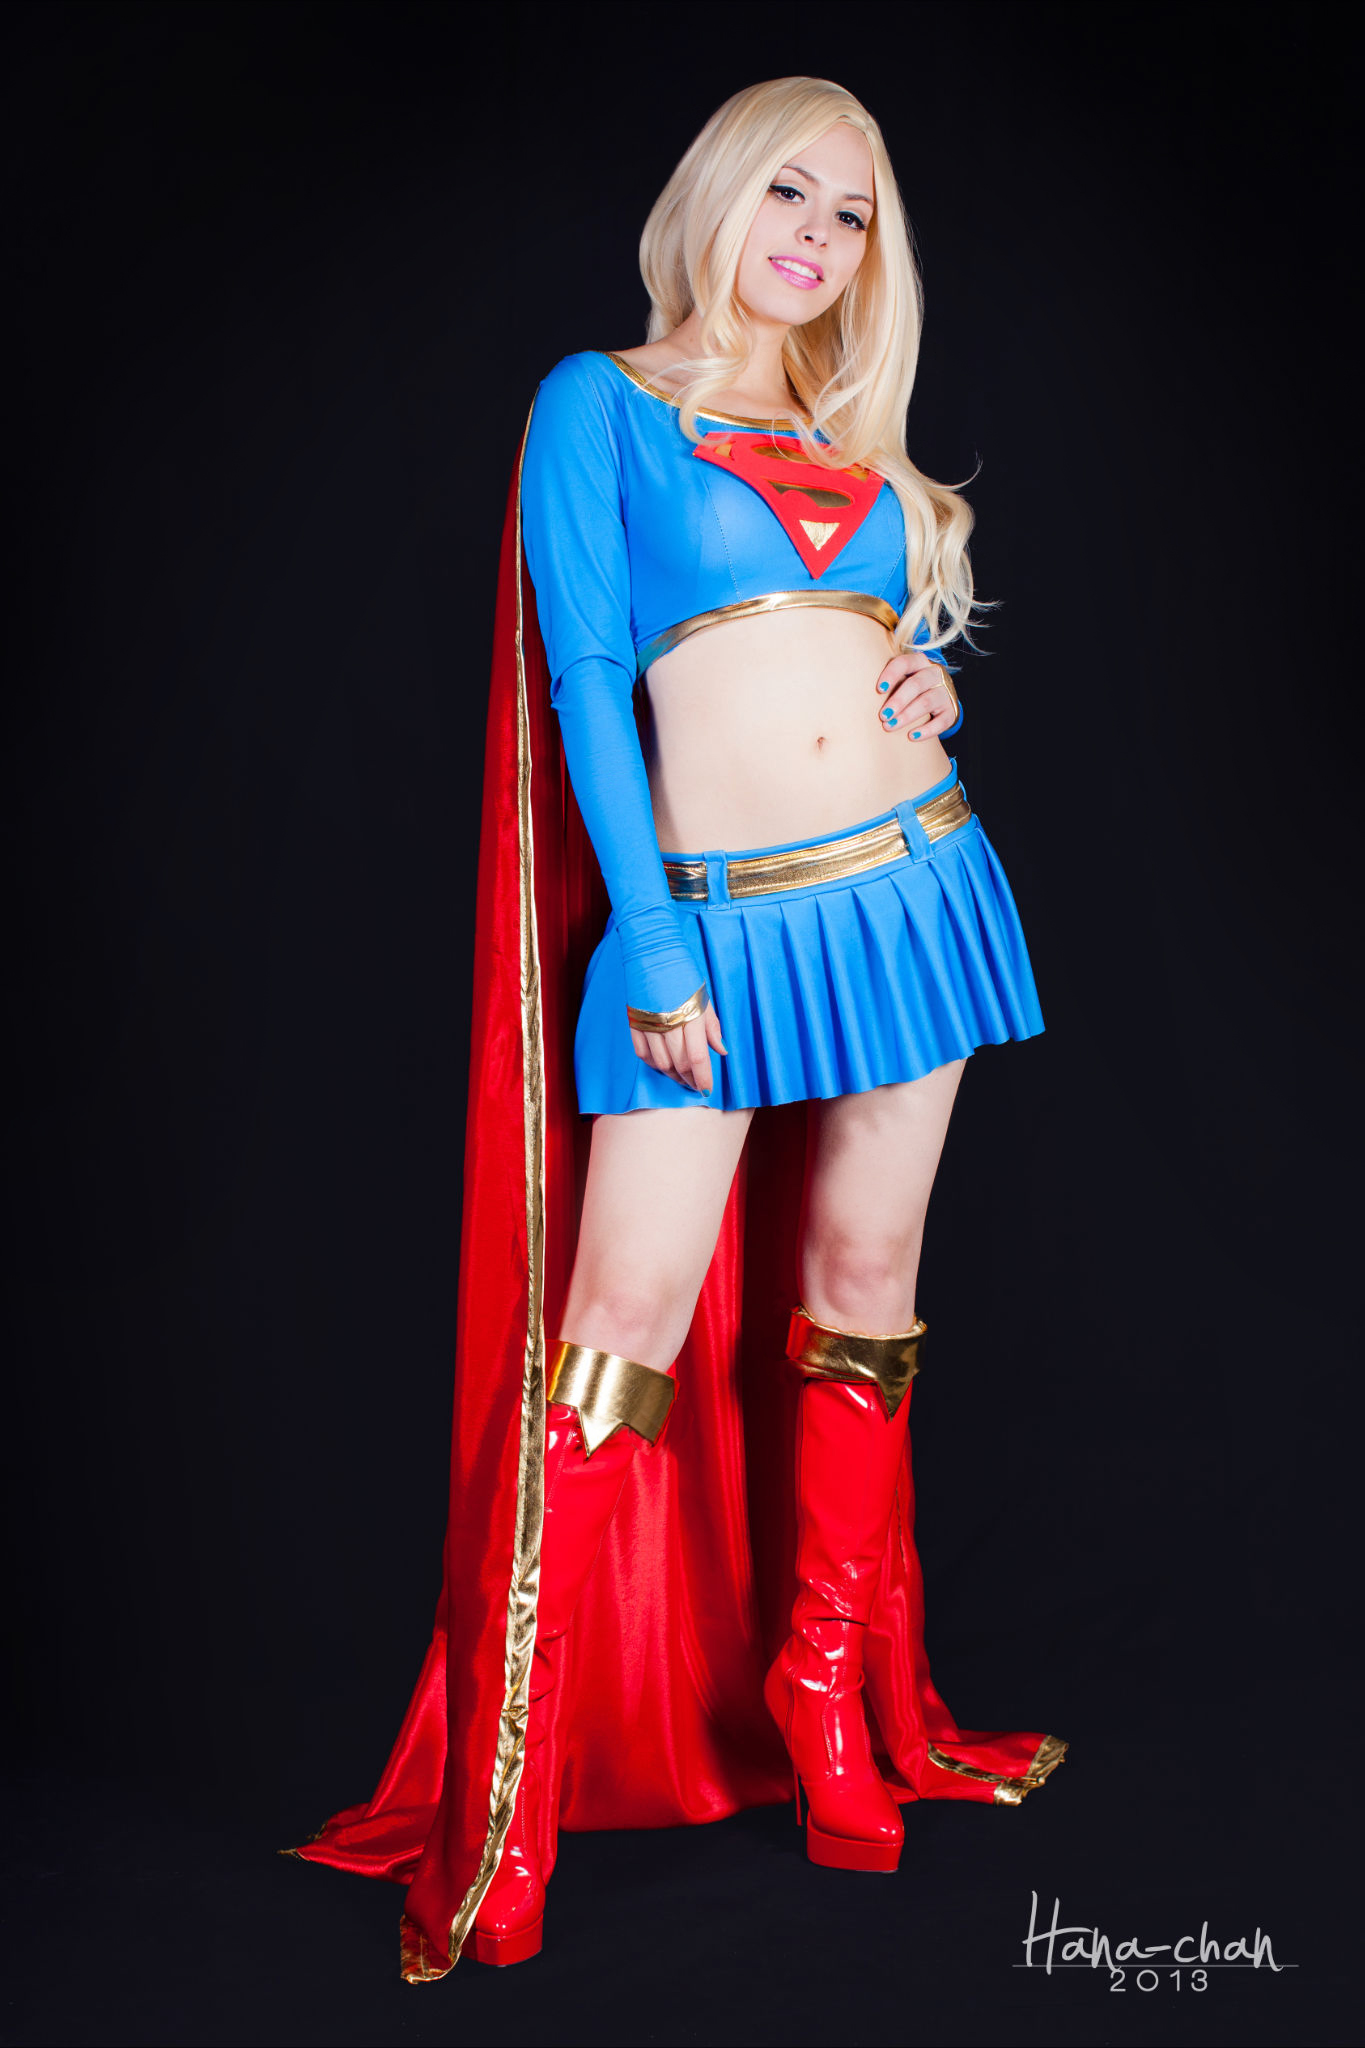 Harley Girl Wallpaper Super Girl Nadyasonika